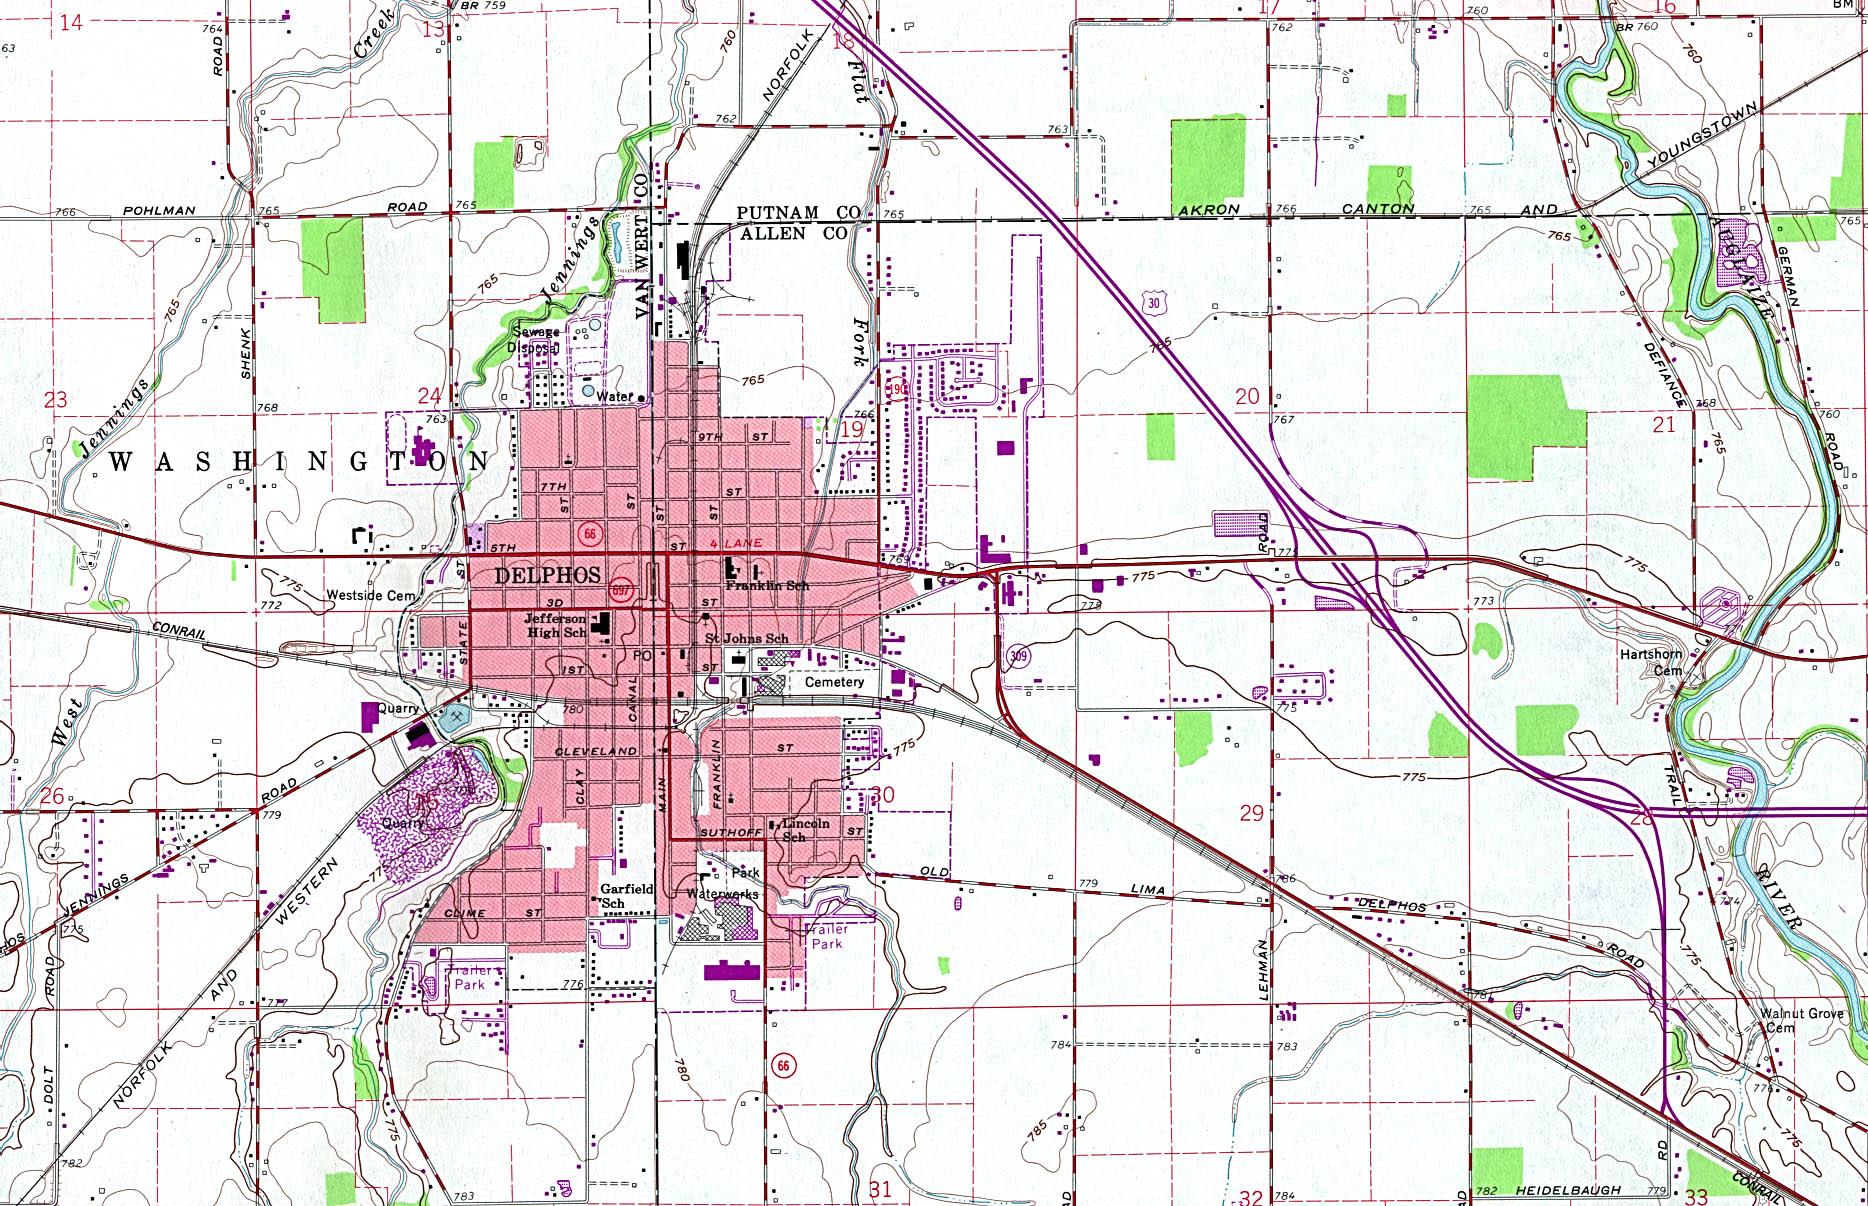 Up Travel Maps Of Ohio Delphos Topographic Map Original - Ohio maps with cities